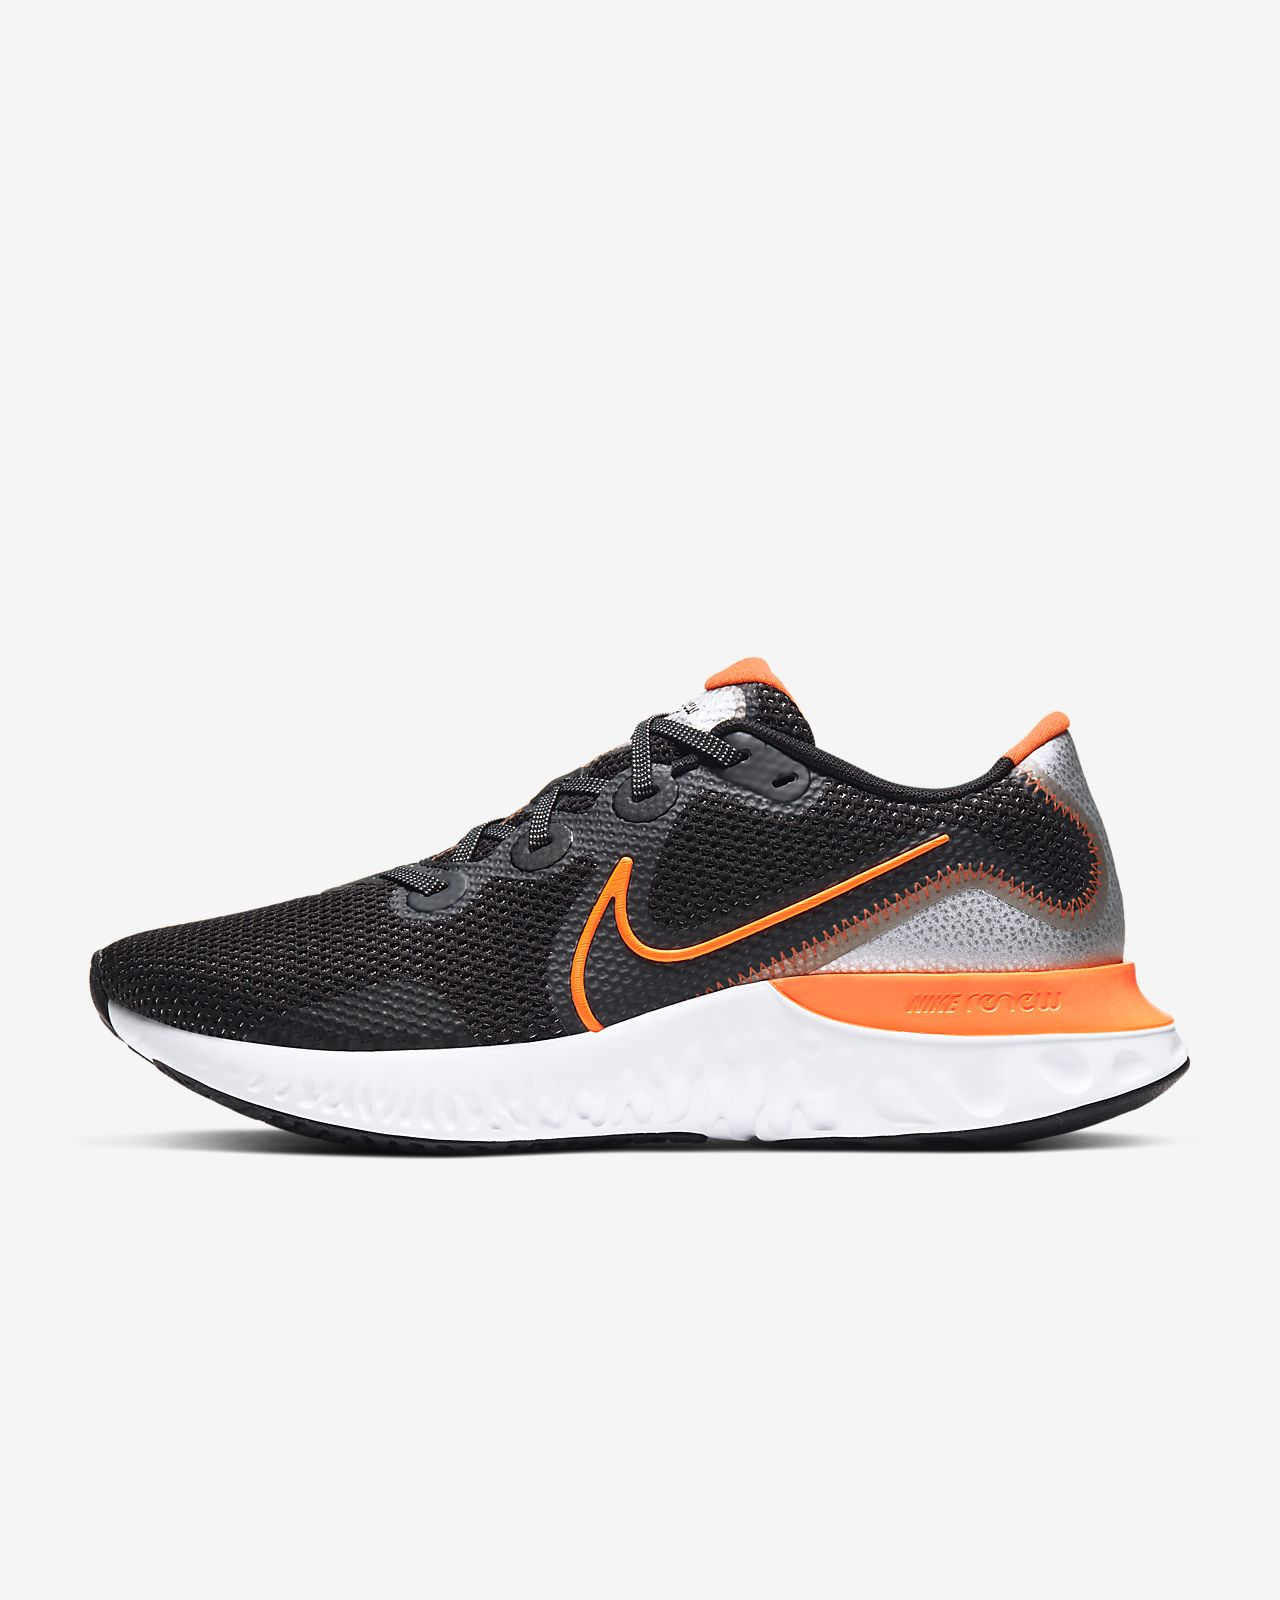 Sapatilhas de running Nike Renew Run para homem